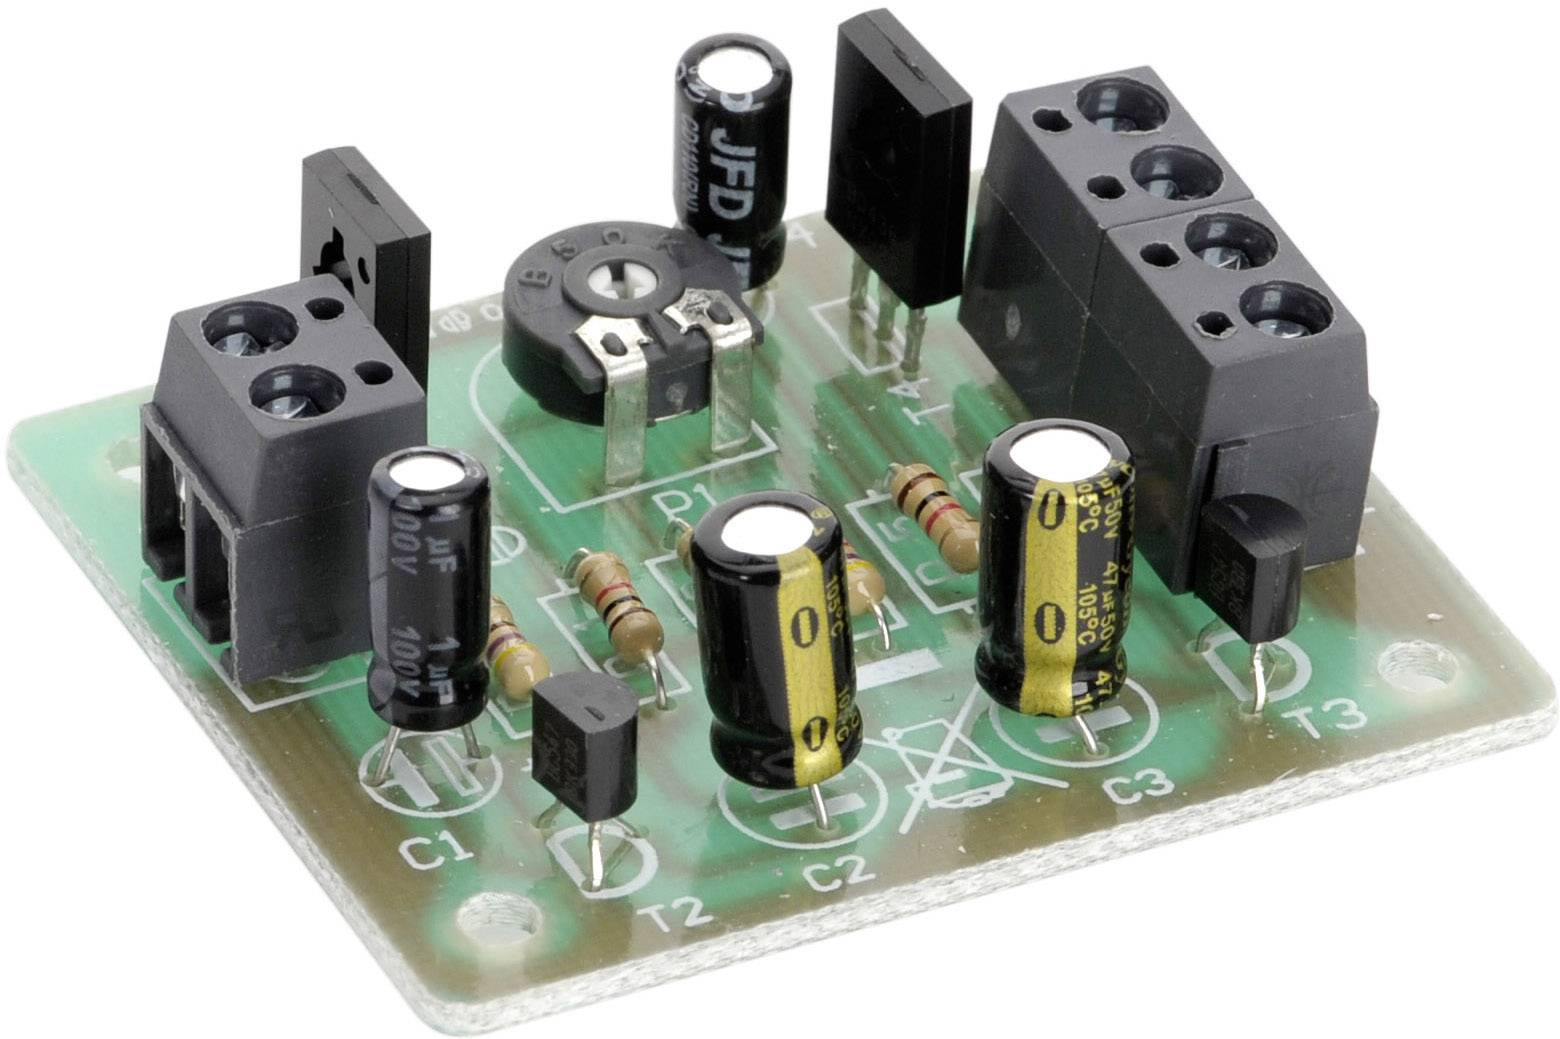 Conrad Components 199605, 4.5 V/DC, 5 V/DC, 6 V/DC, 9 V/DC, 12 V/DC, stavebnice